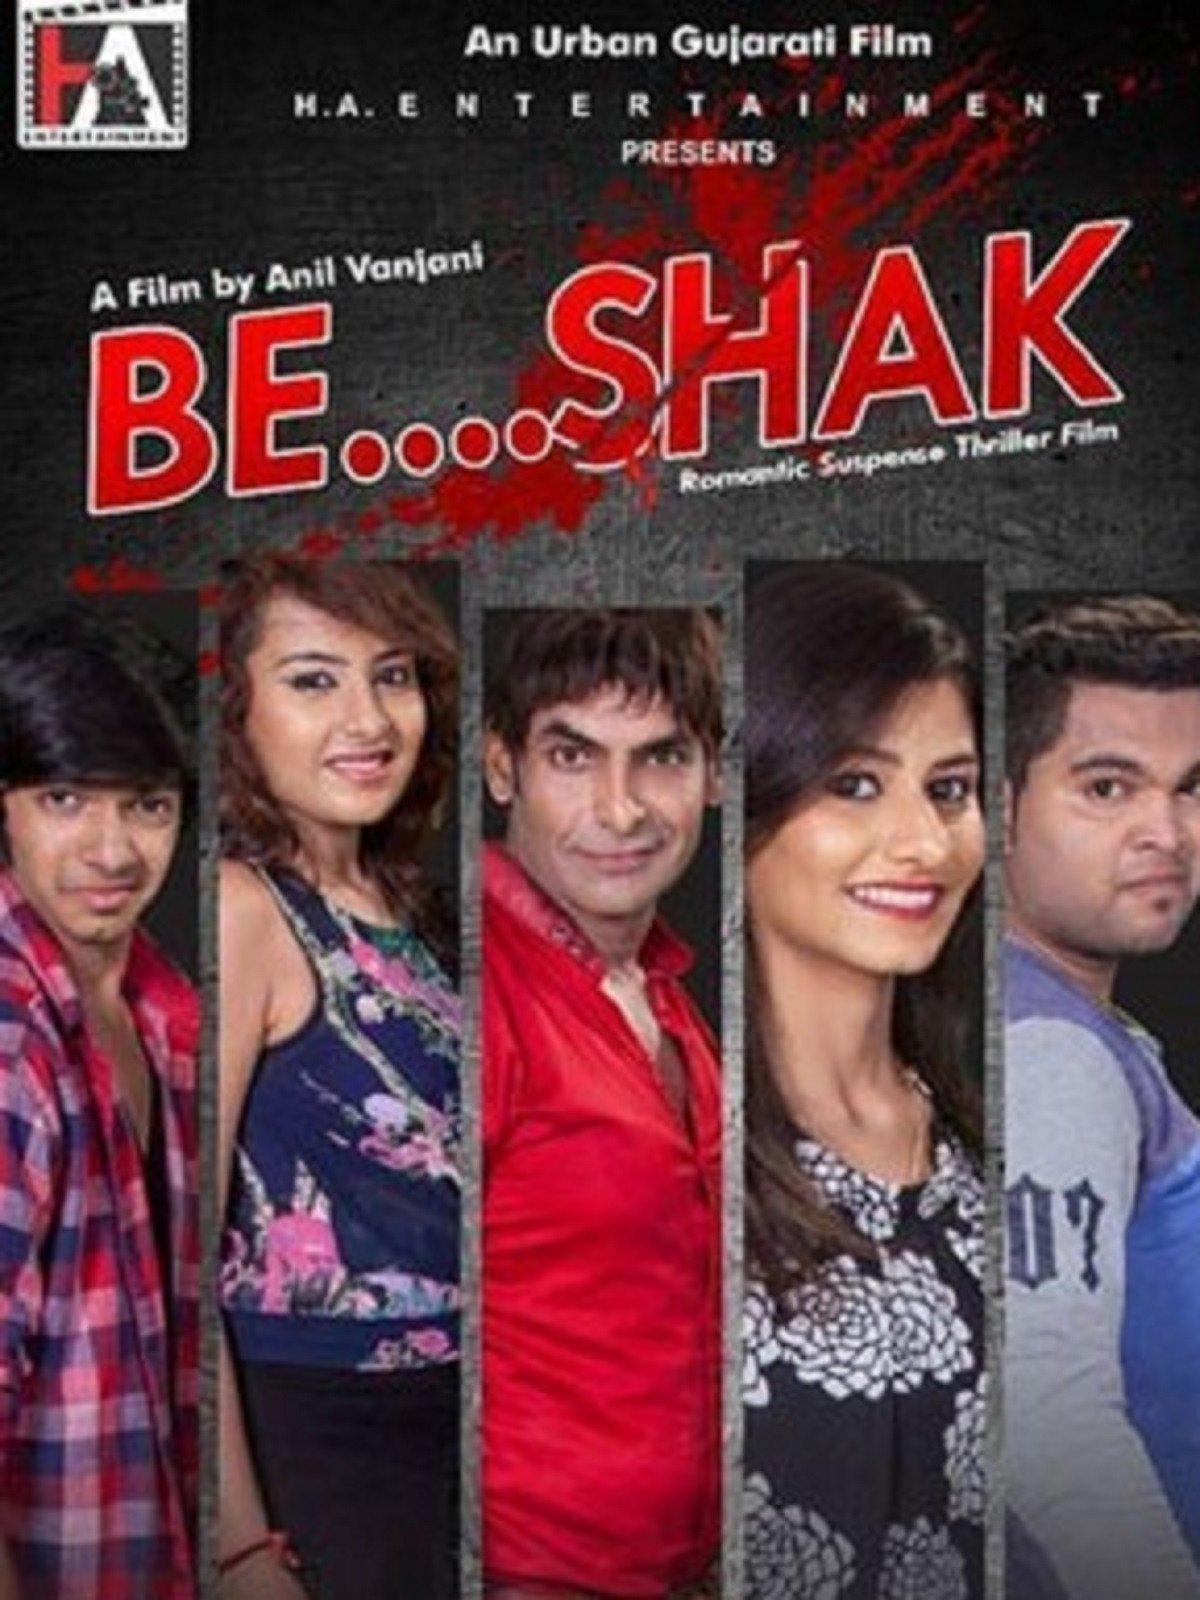 Be.Shak